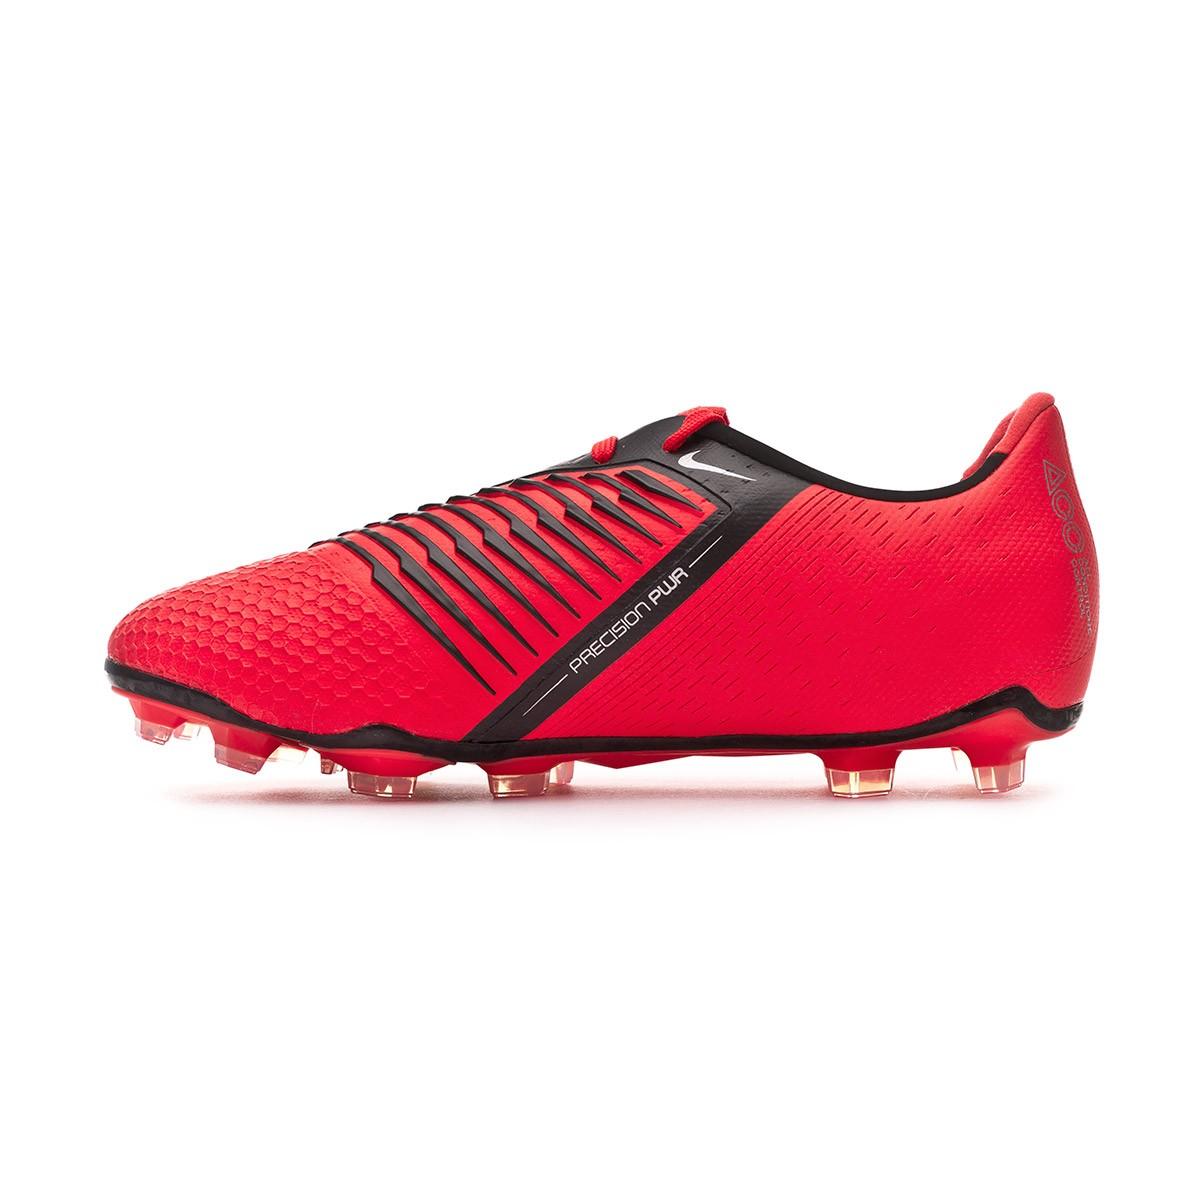 66201120d Football Boots Nike Kids Phantom Venom Elite FG Bright crimson-Black -  Football store Fútbol Emotion